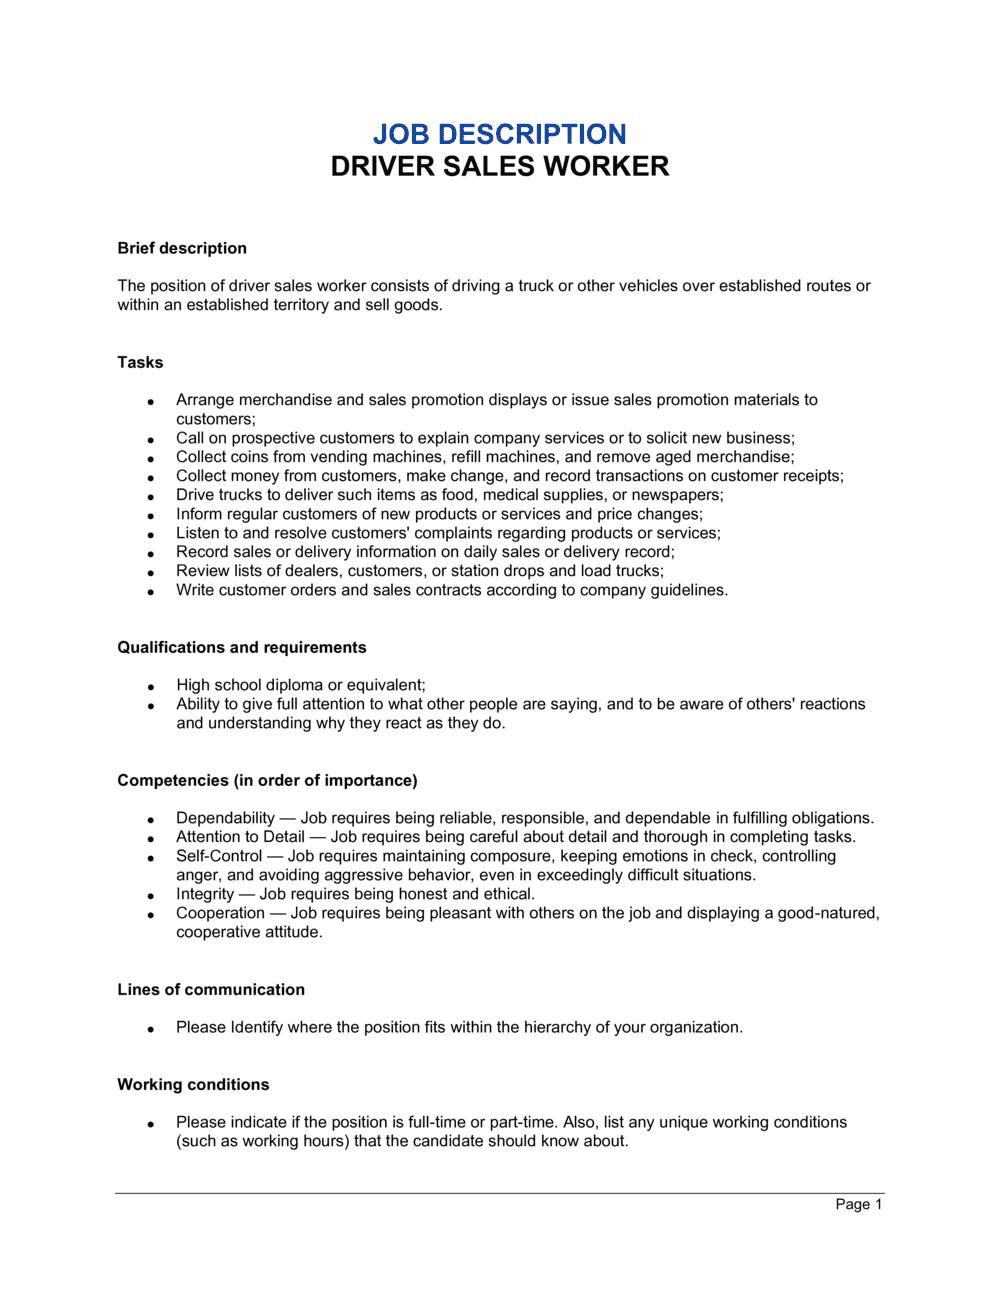 Business-in-a-Box's Driver Sales Worker Job Description Template